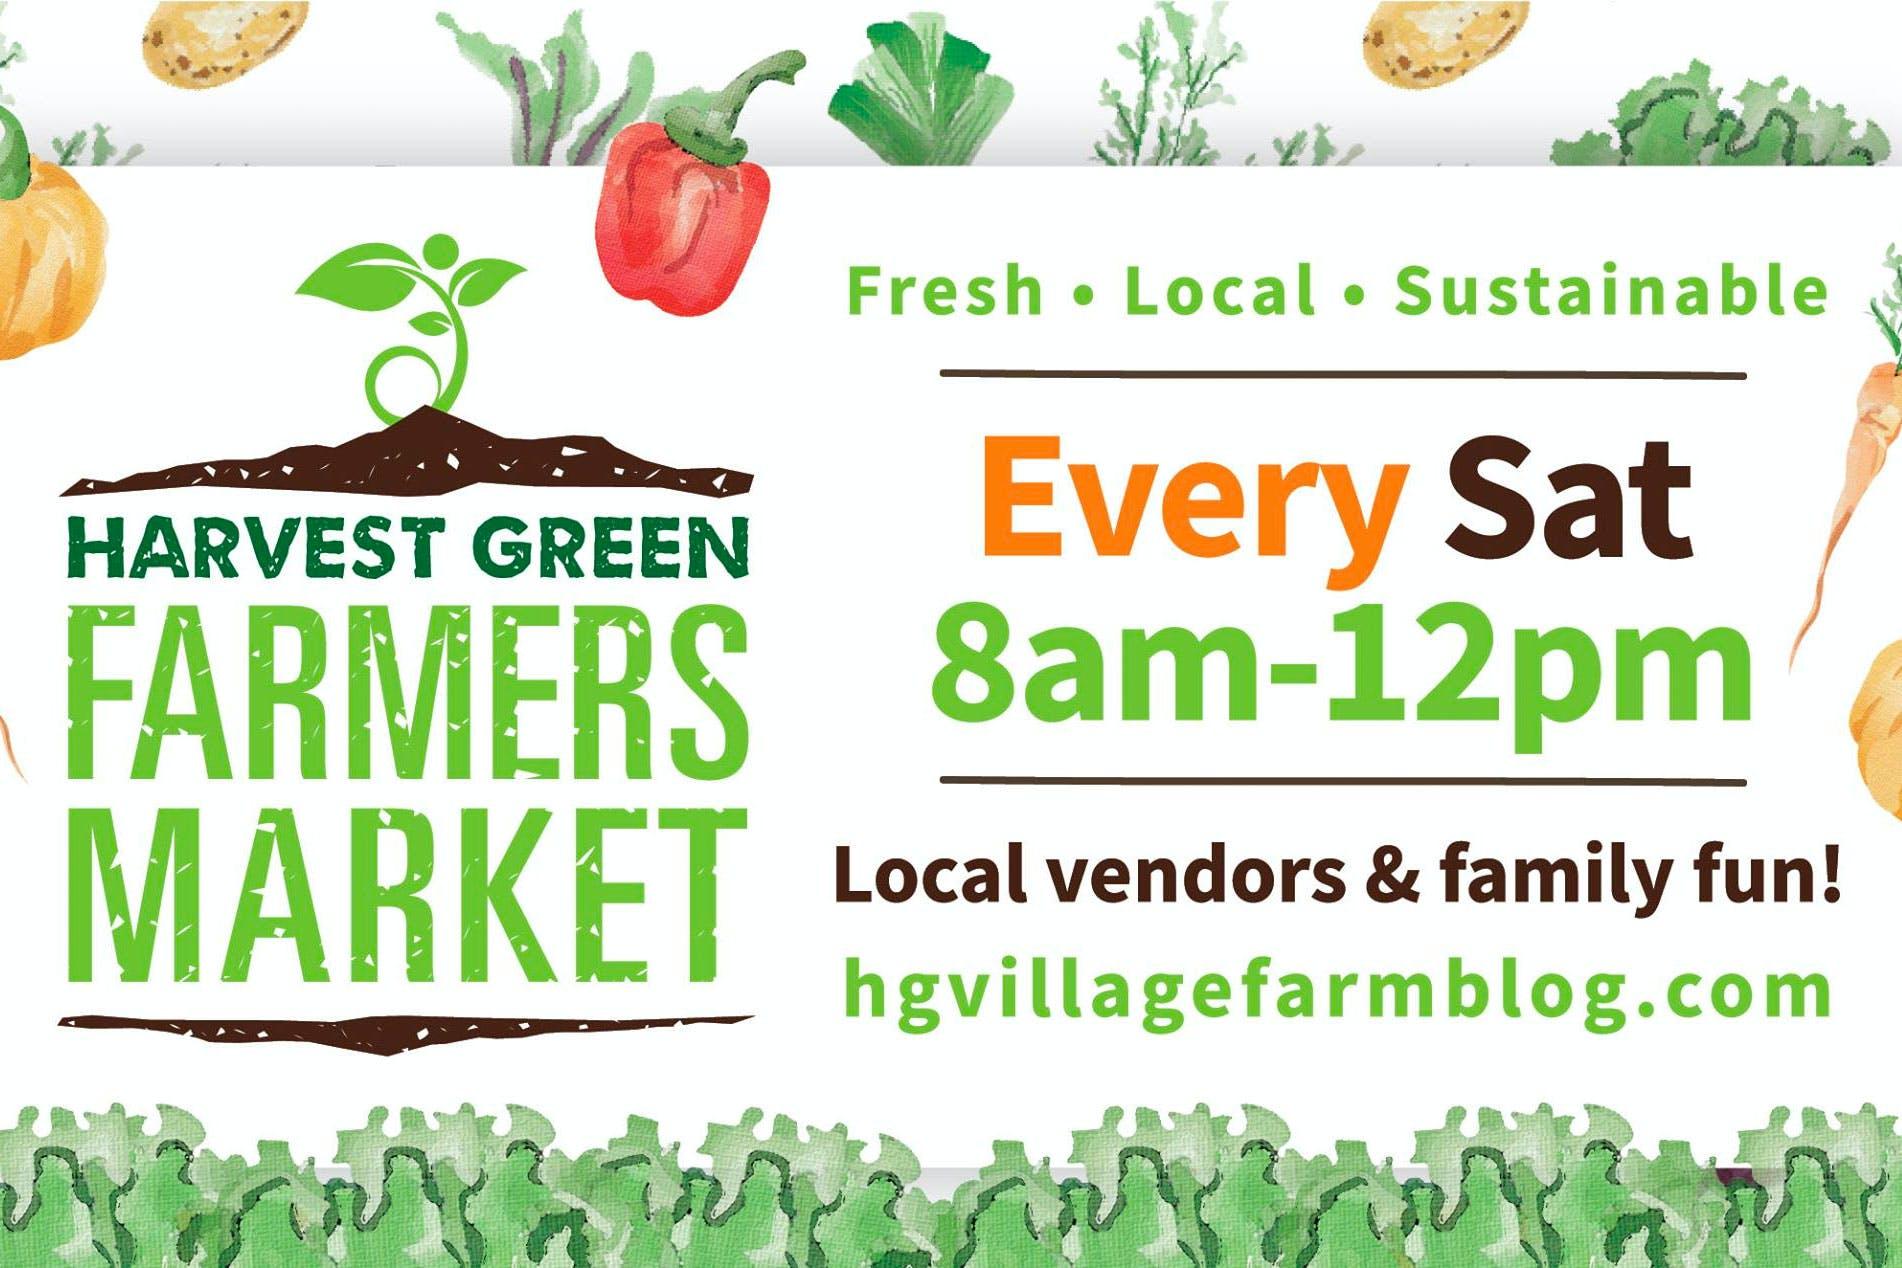 harvest-green-farmers-market-richmond-tx